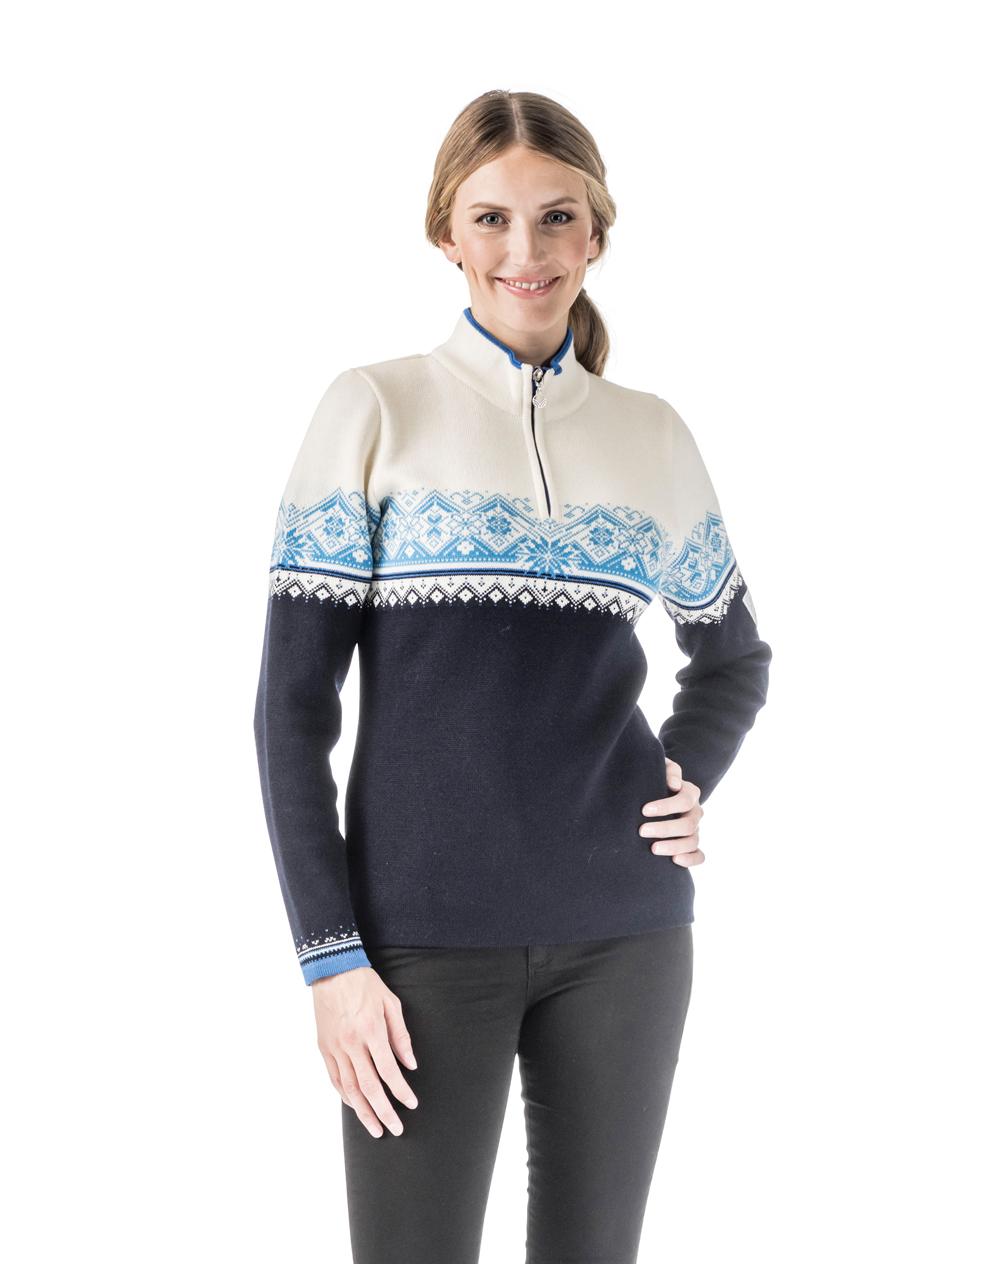 St.Moritz Women's Sweater